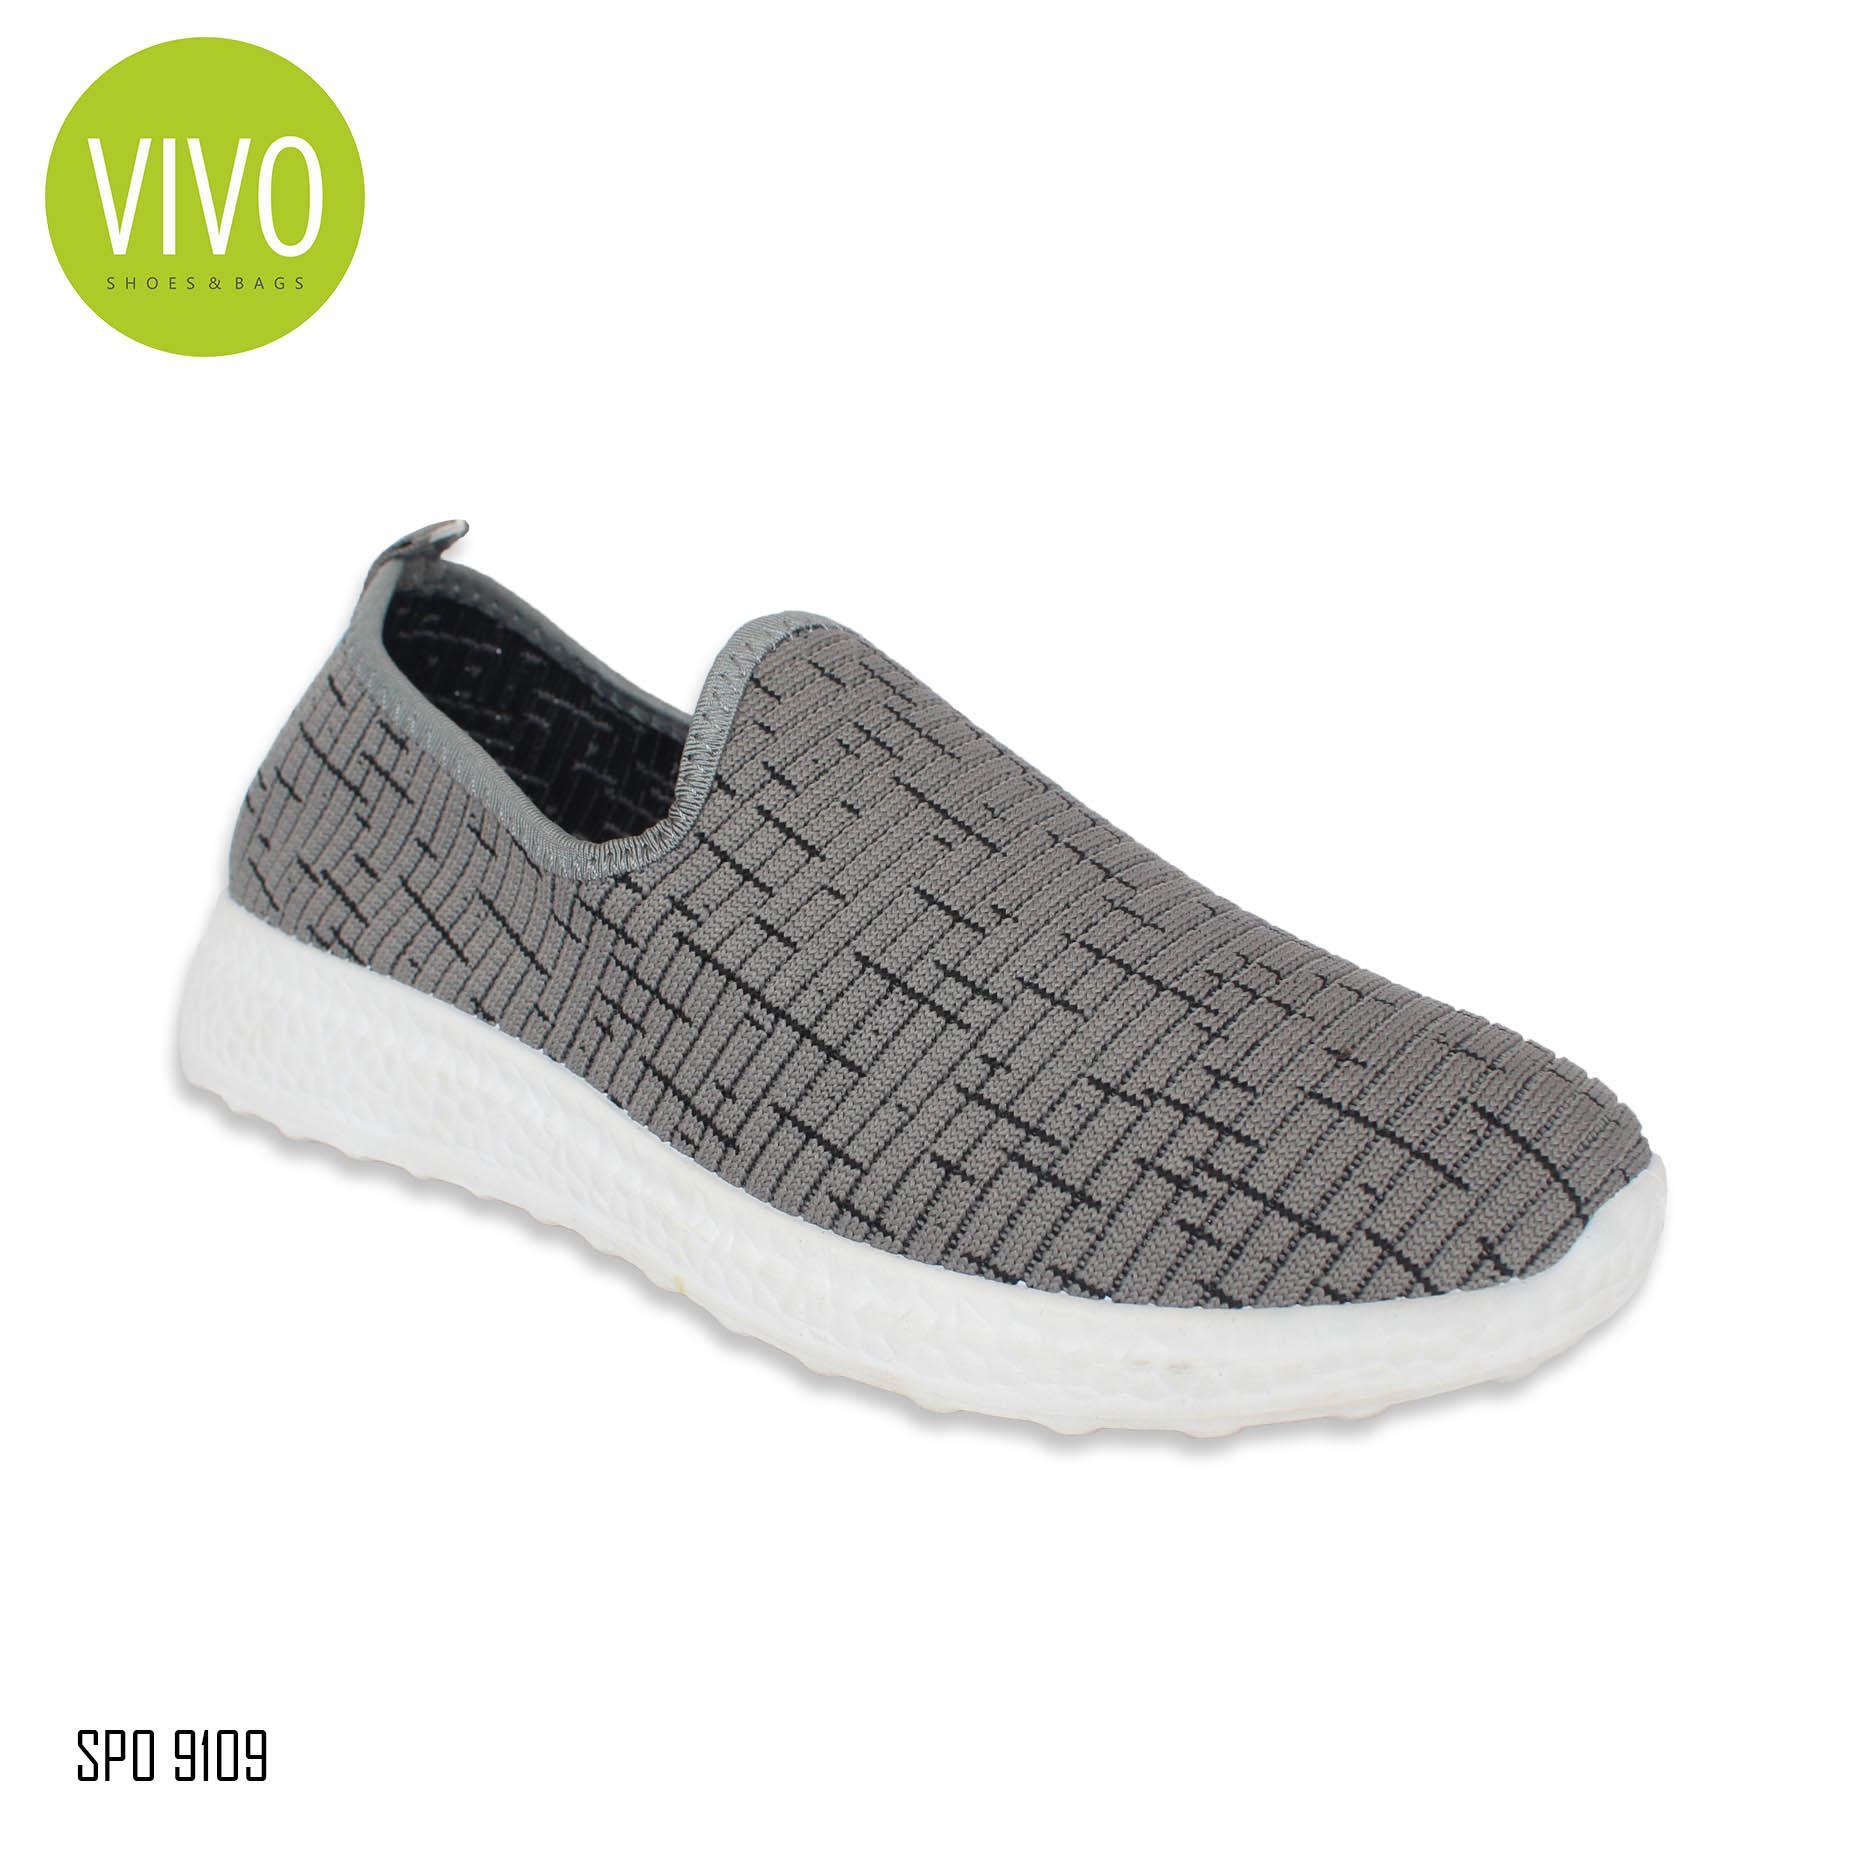 Vivo Fashion Sepatu Wanita/ Sepatu Casual Wanita/ Sepatu Slip On Wanita/ Sepatu Sneakers Wanita SP09109 - Grey Size 36/41